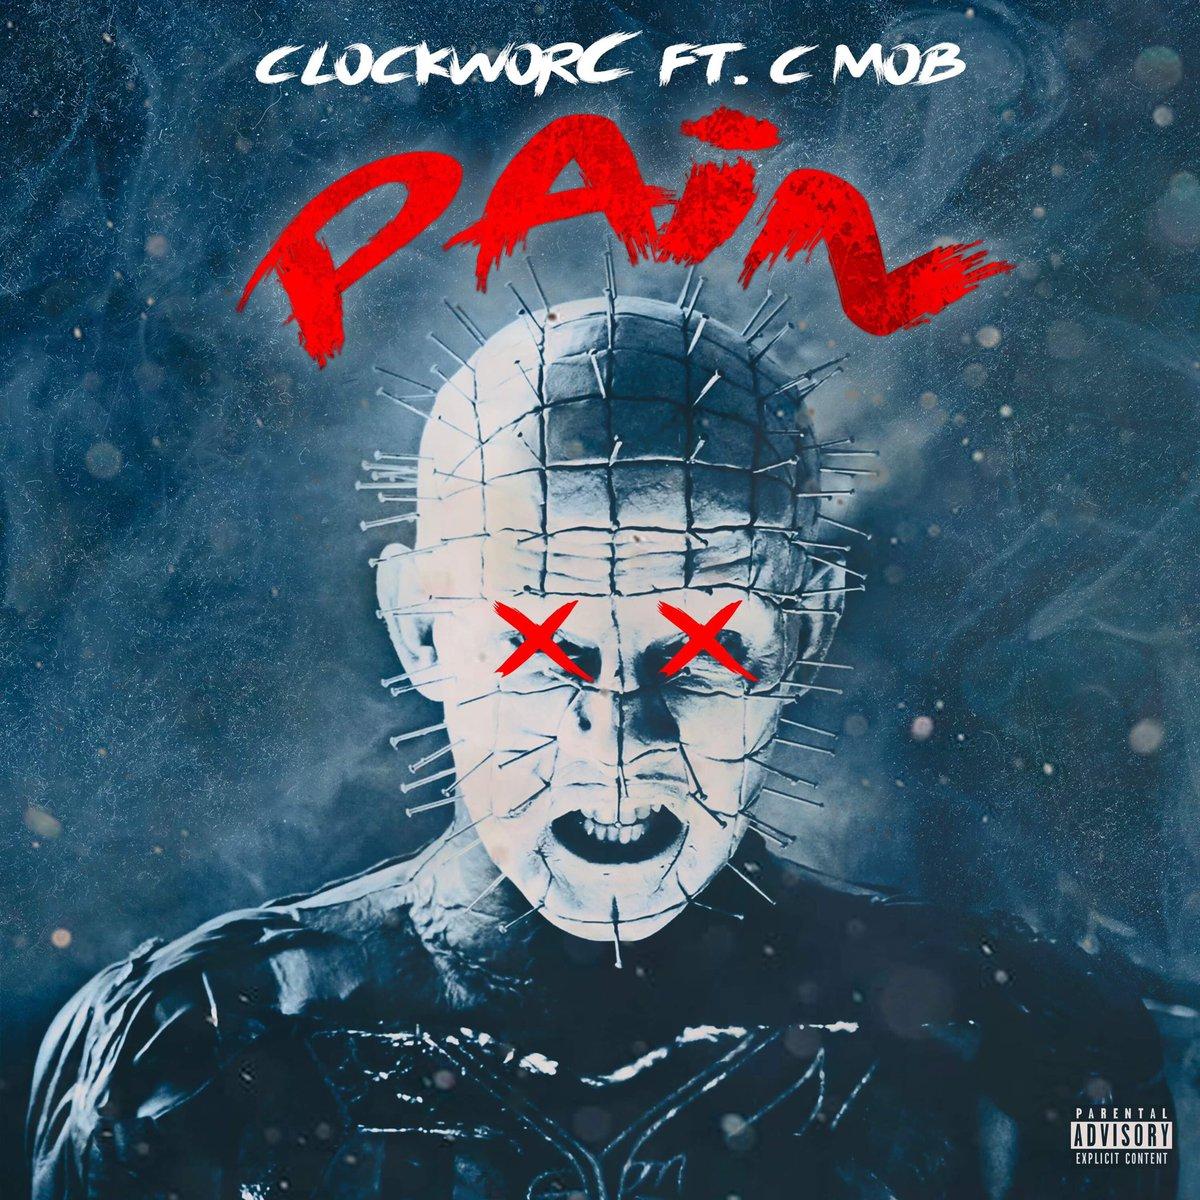 ⚔️PAIN⚔️ Single Coming Soon... Ft @cmob765 Prod @iniko_beats Grafix @infgang . . . . #ClockworC #CMob #Pain #banger #single #comingsoon #raw #hiphop #boombap #rap #soul #undergroundhiphop #destruction #beats #production #hellraiser #leggo